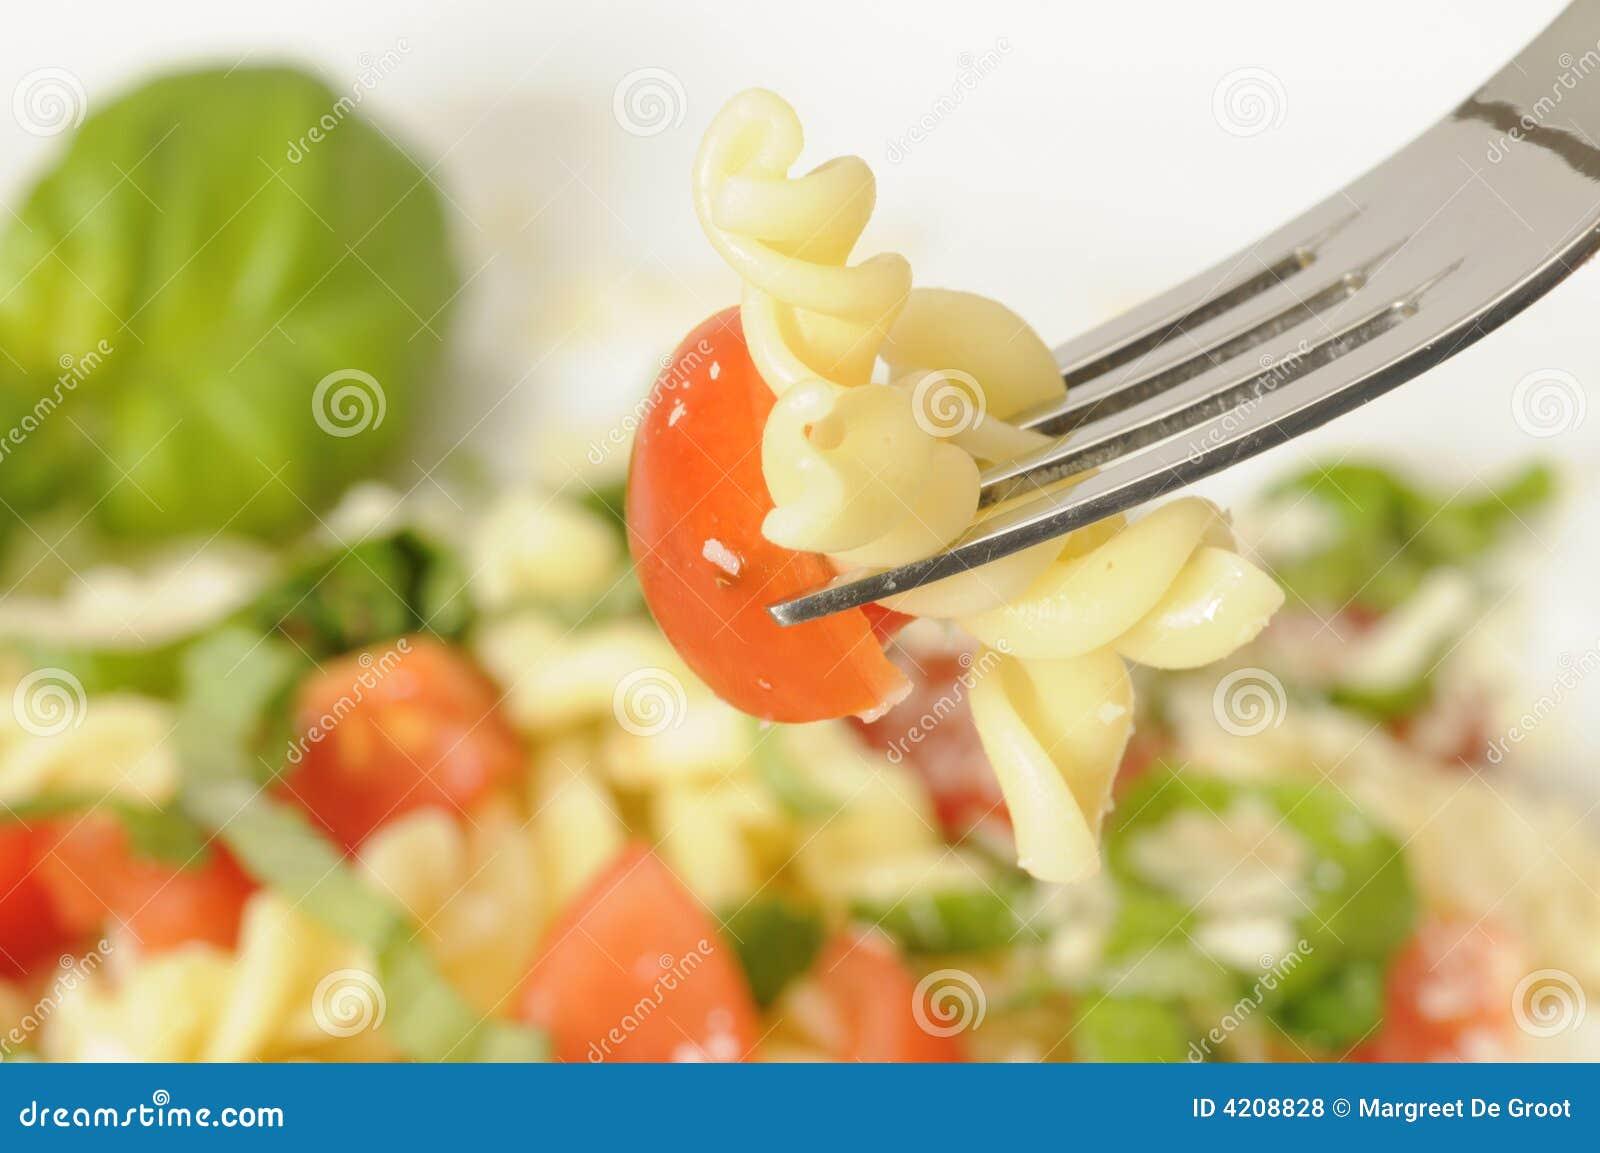 Pasta salad close-up